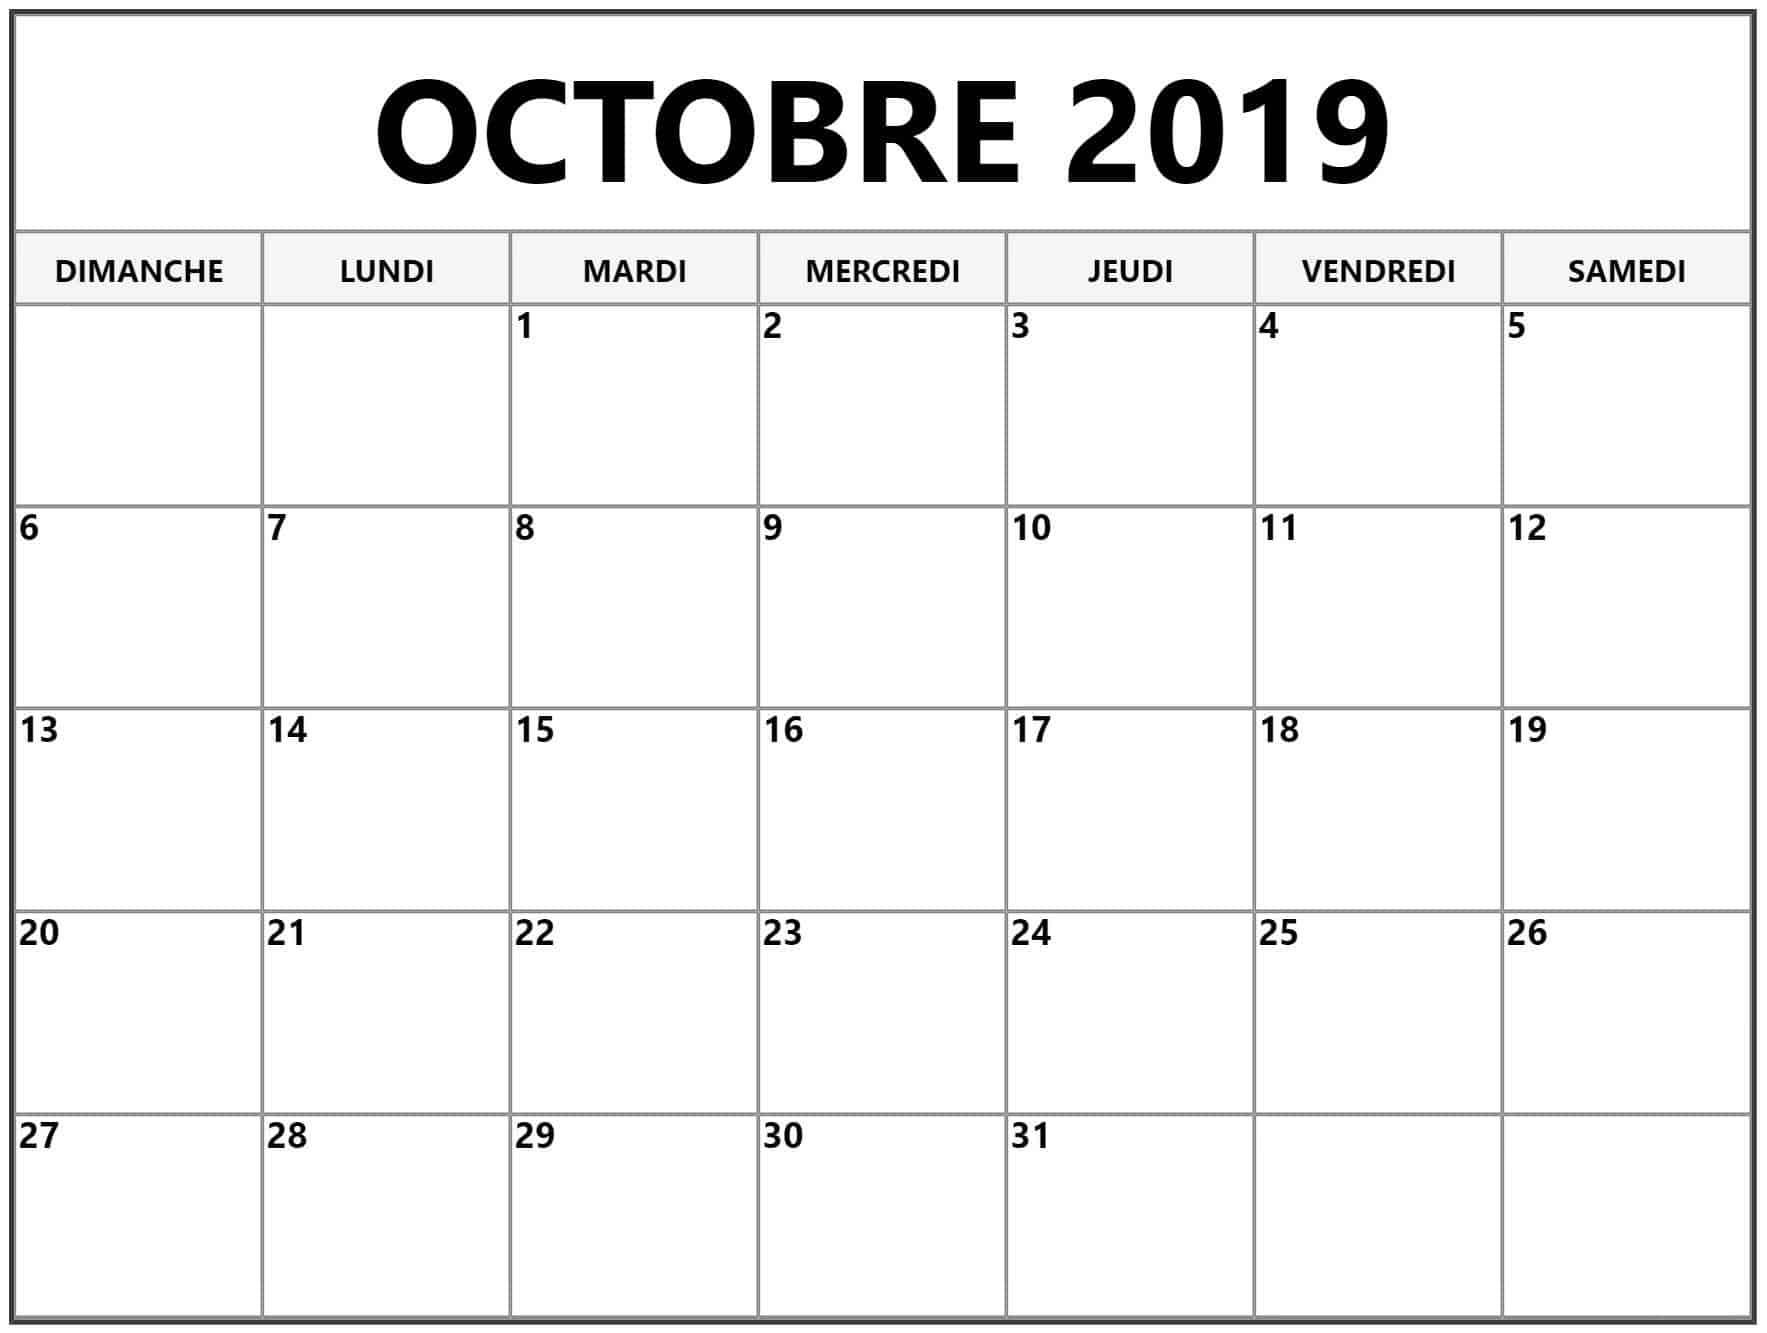 Calendrier 2019 Mois Par Mois A Imprimer.Calendrier Octobre 2019 A Imprimer Nosovia Com